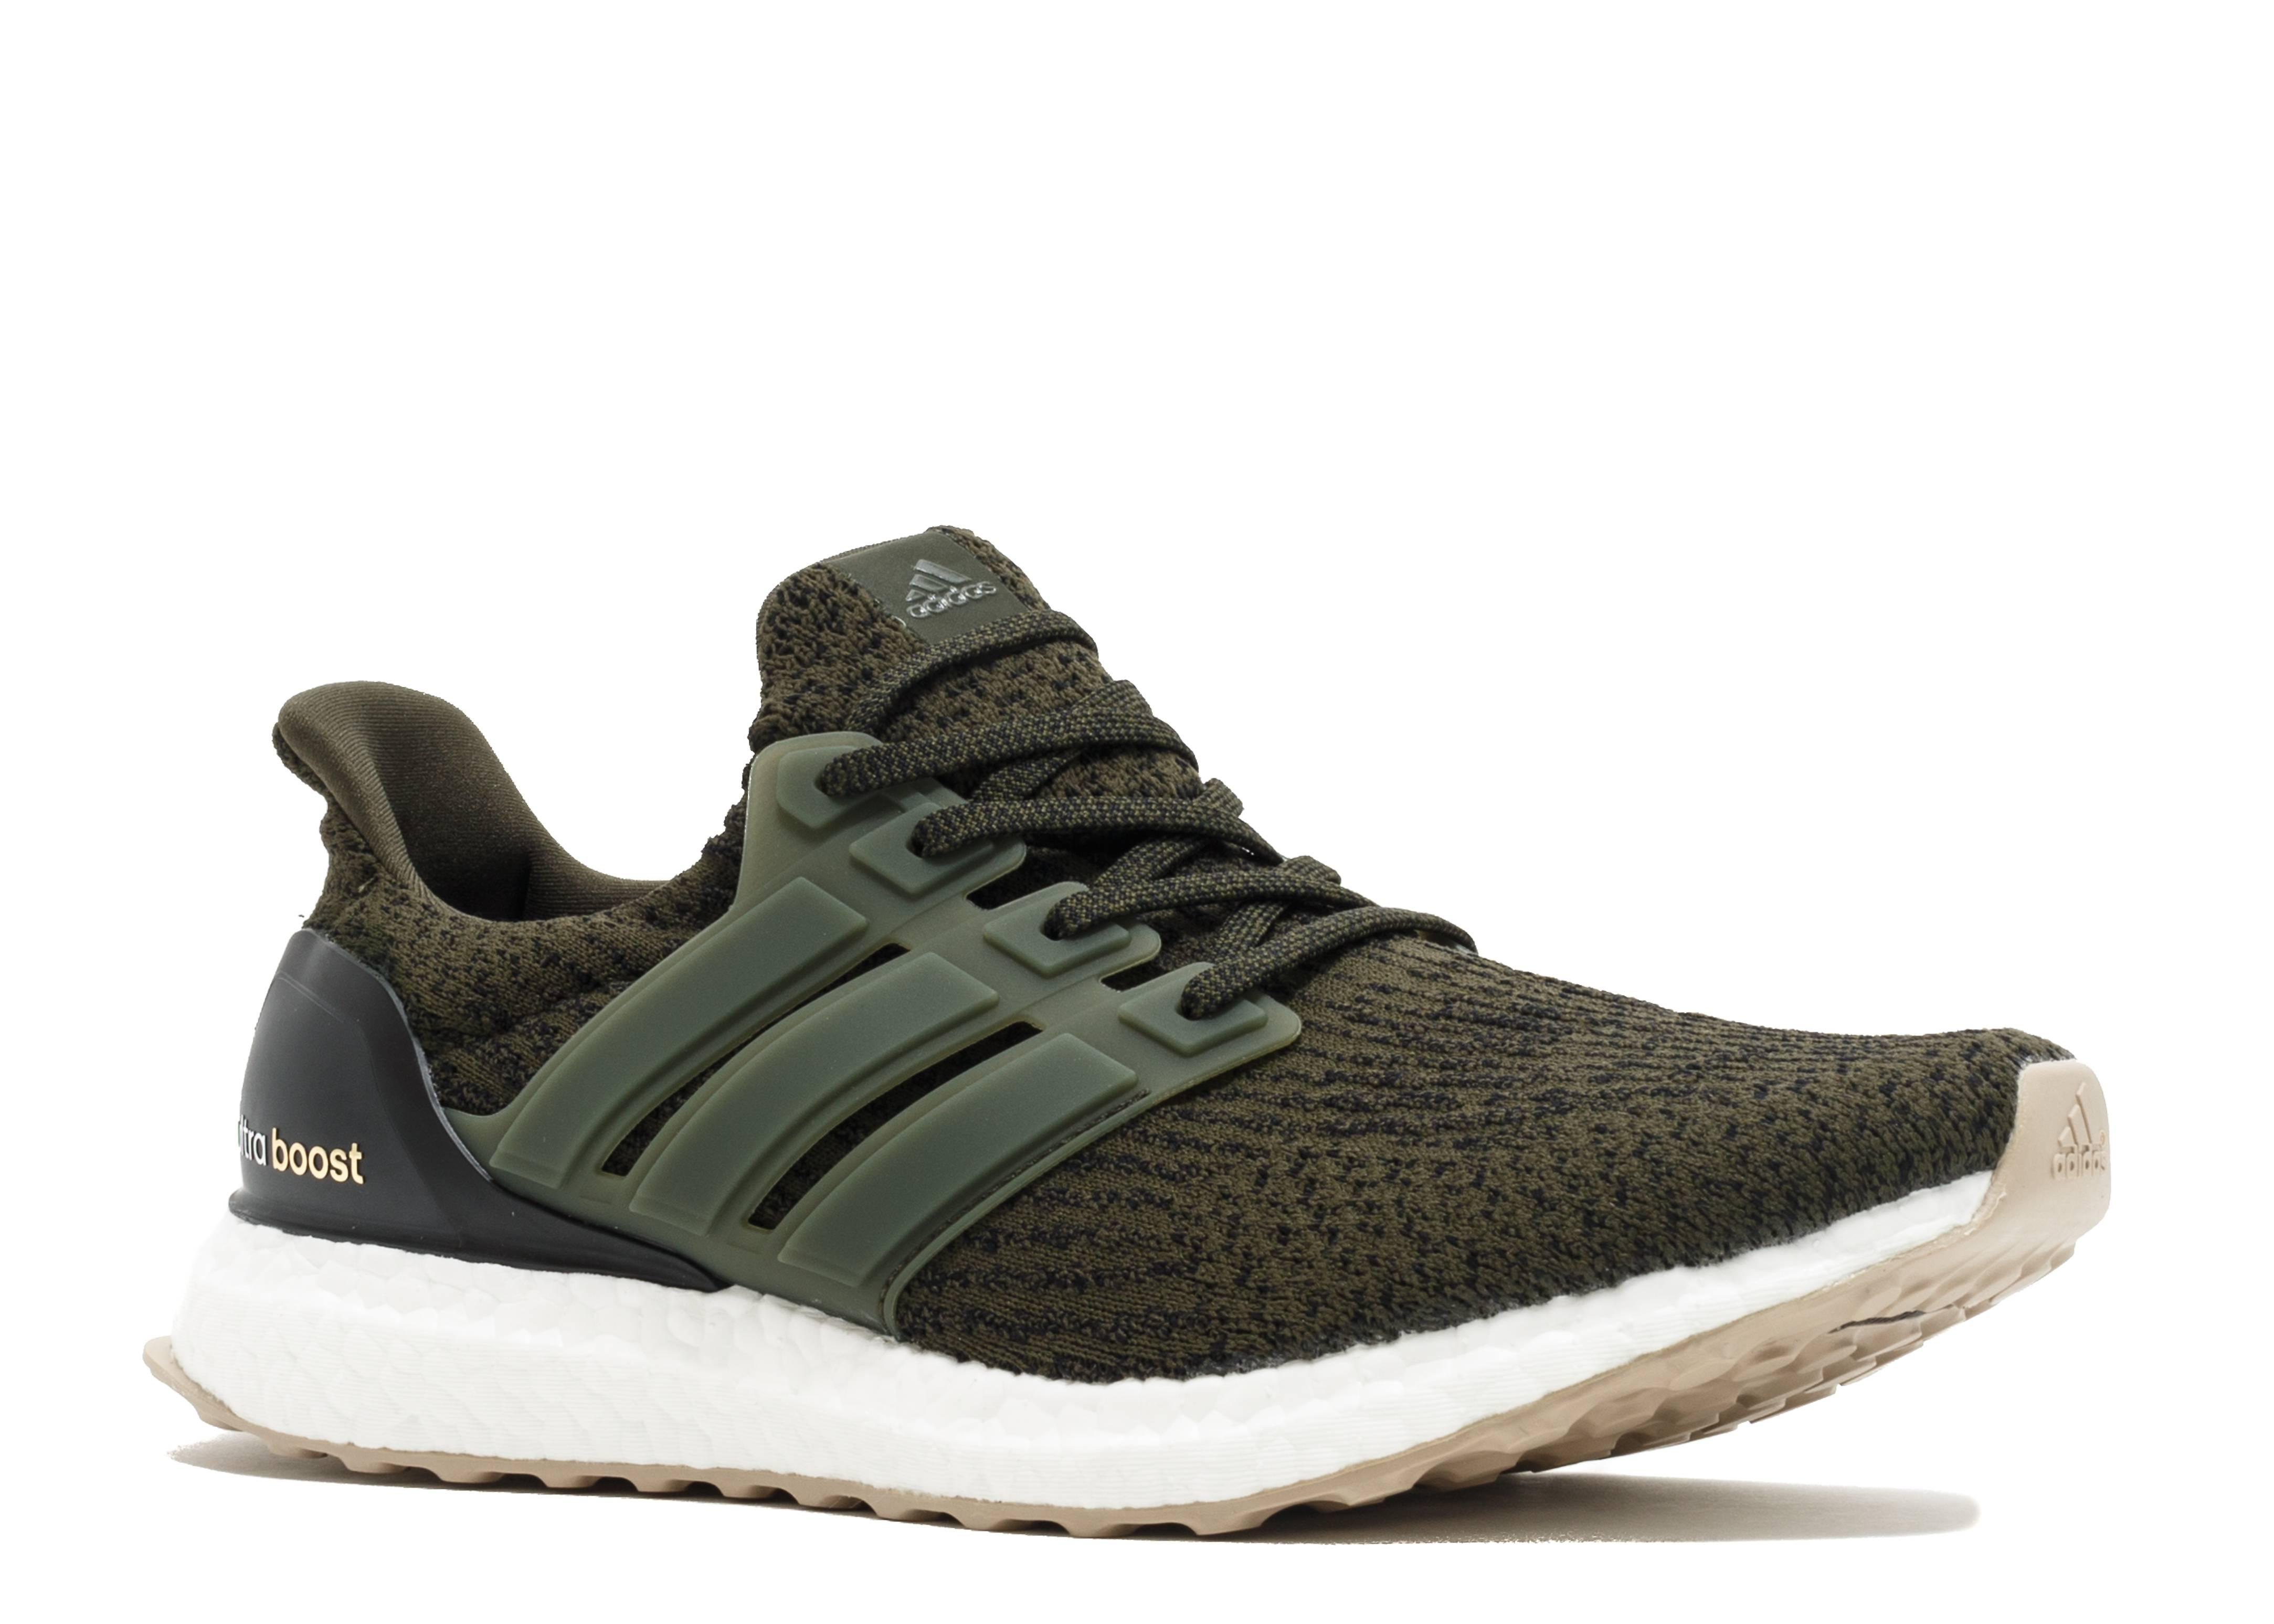 on sale 3b4b2 452f5 Kick Avenue - Authentic Sneakers